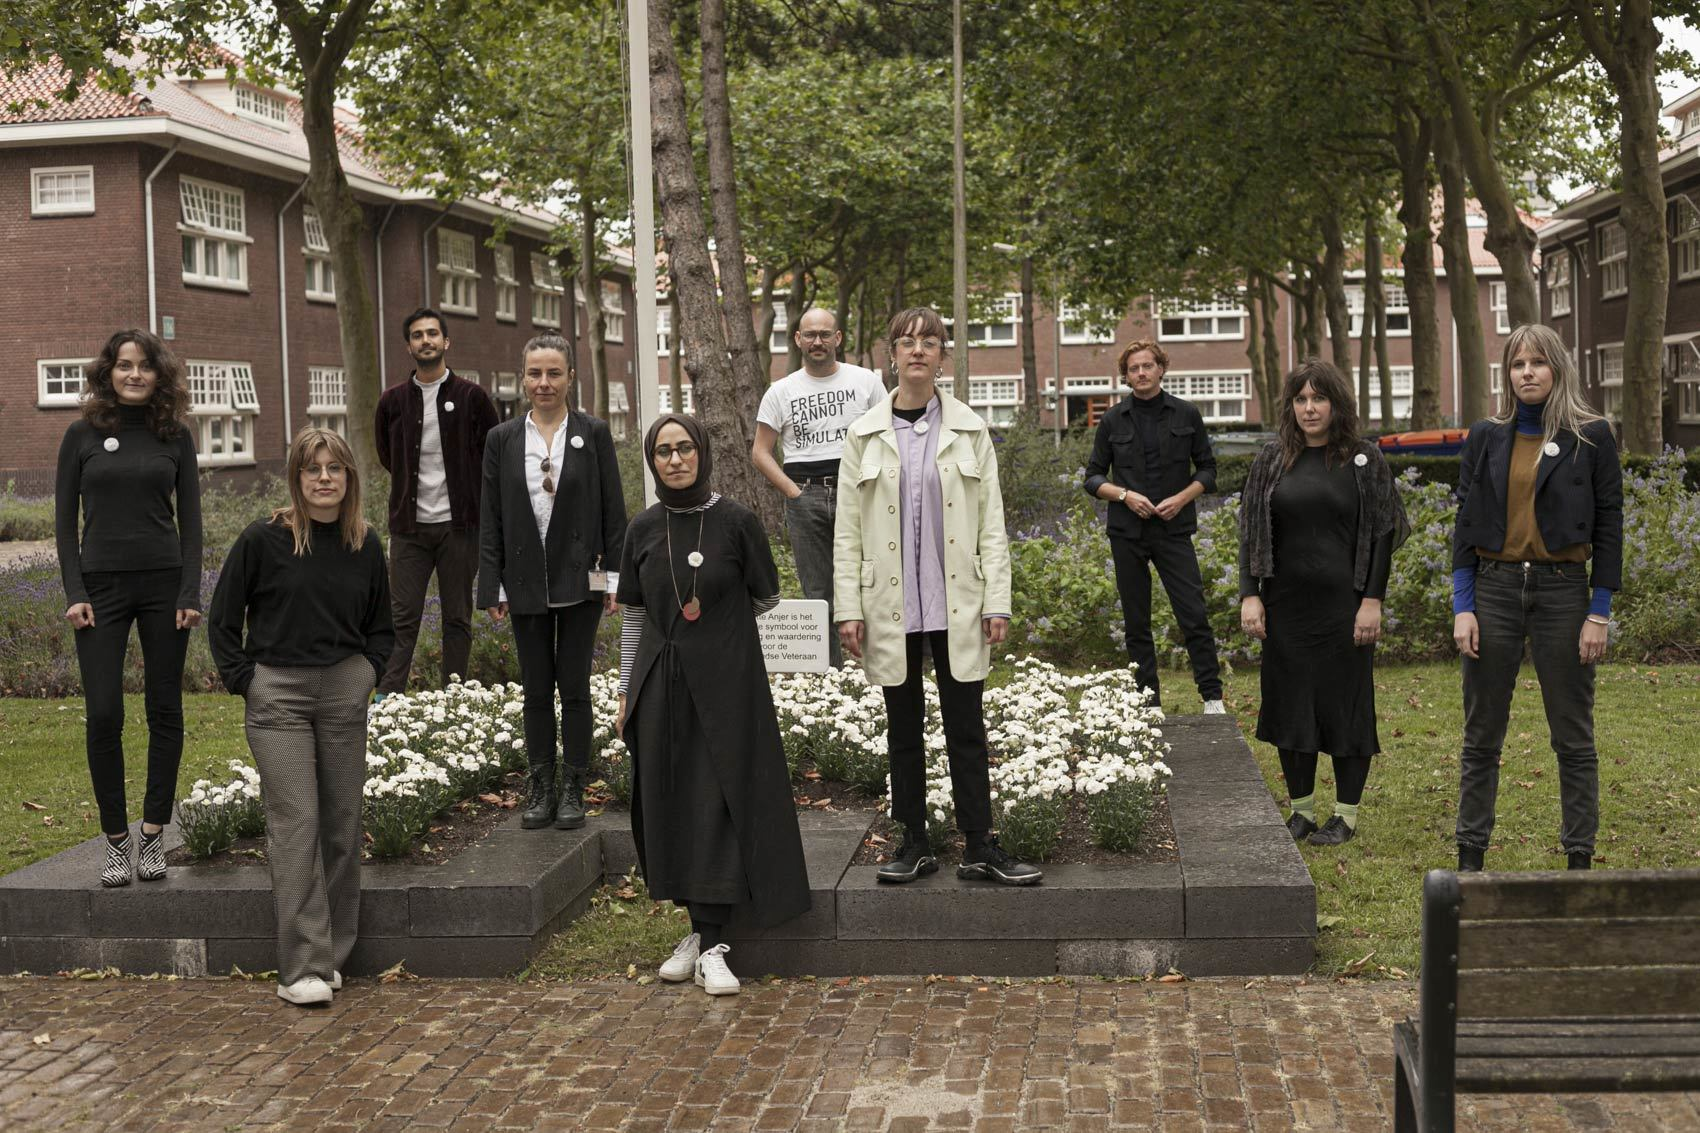 Witte Anjer Prijs 2020 design contest participants